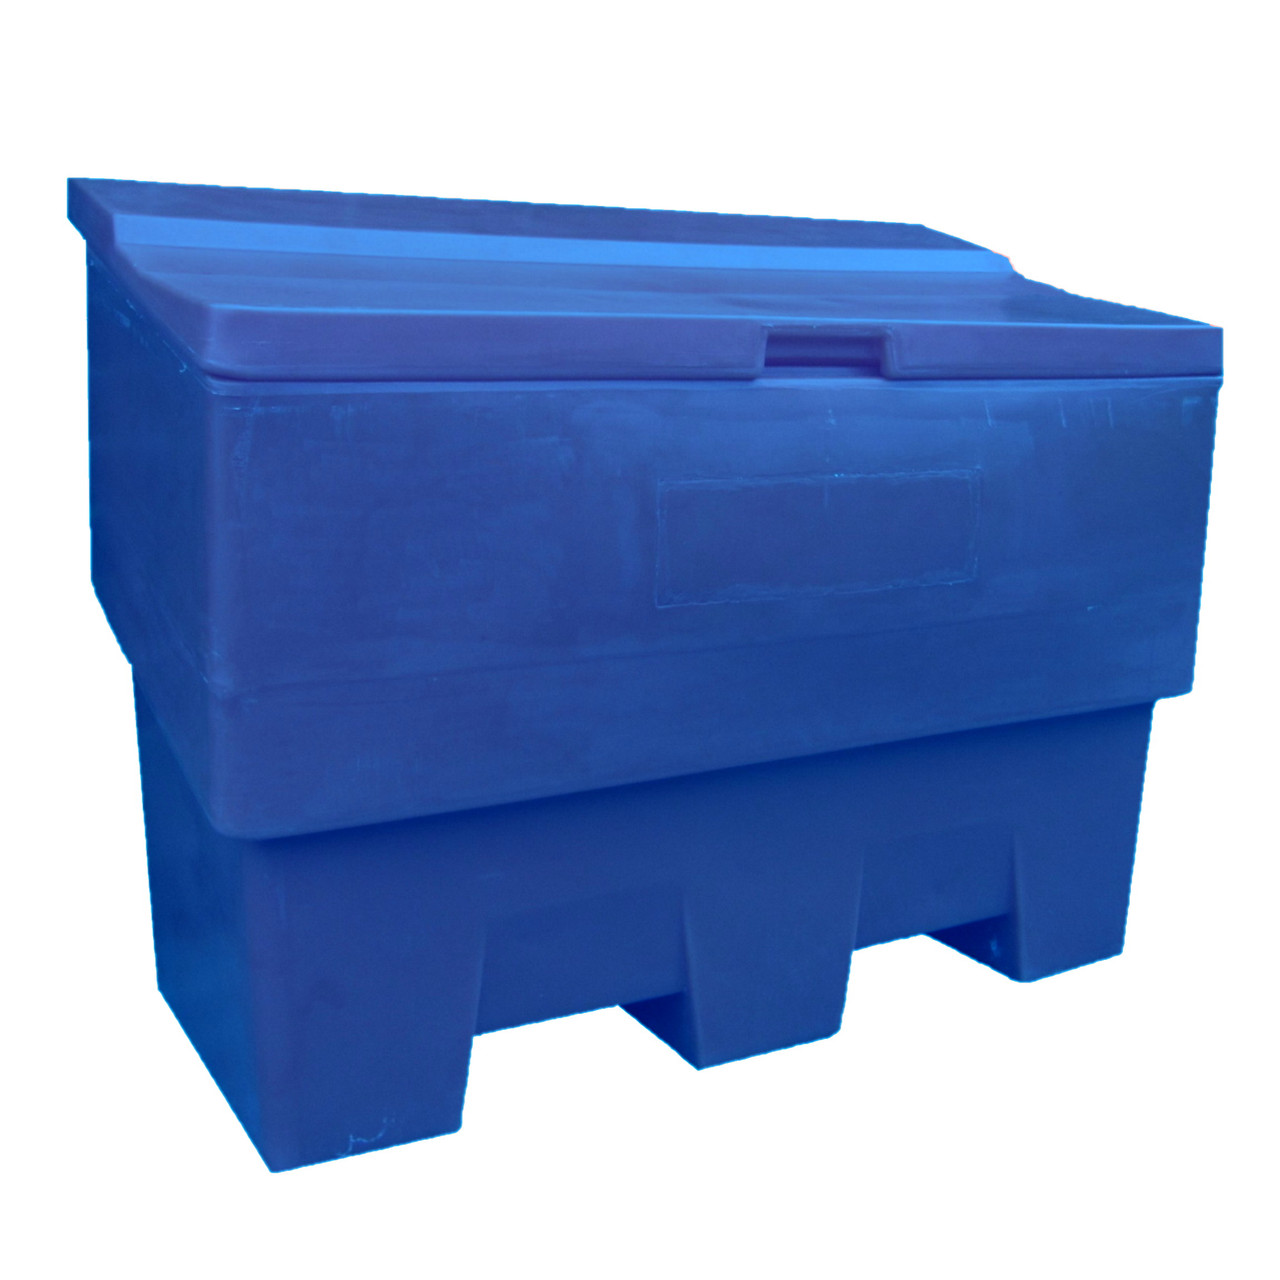 Blue 400 Litre outdoor storage box